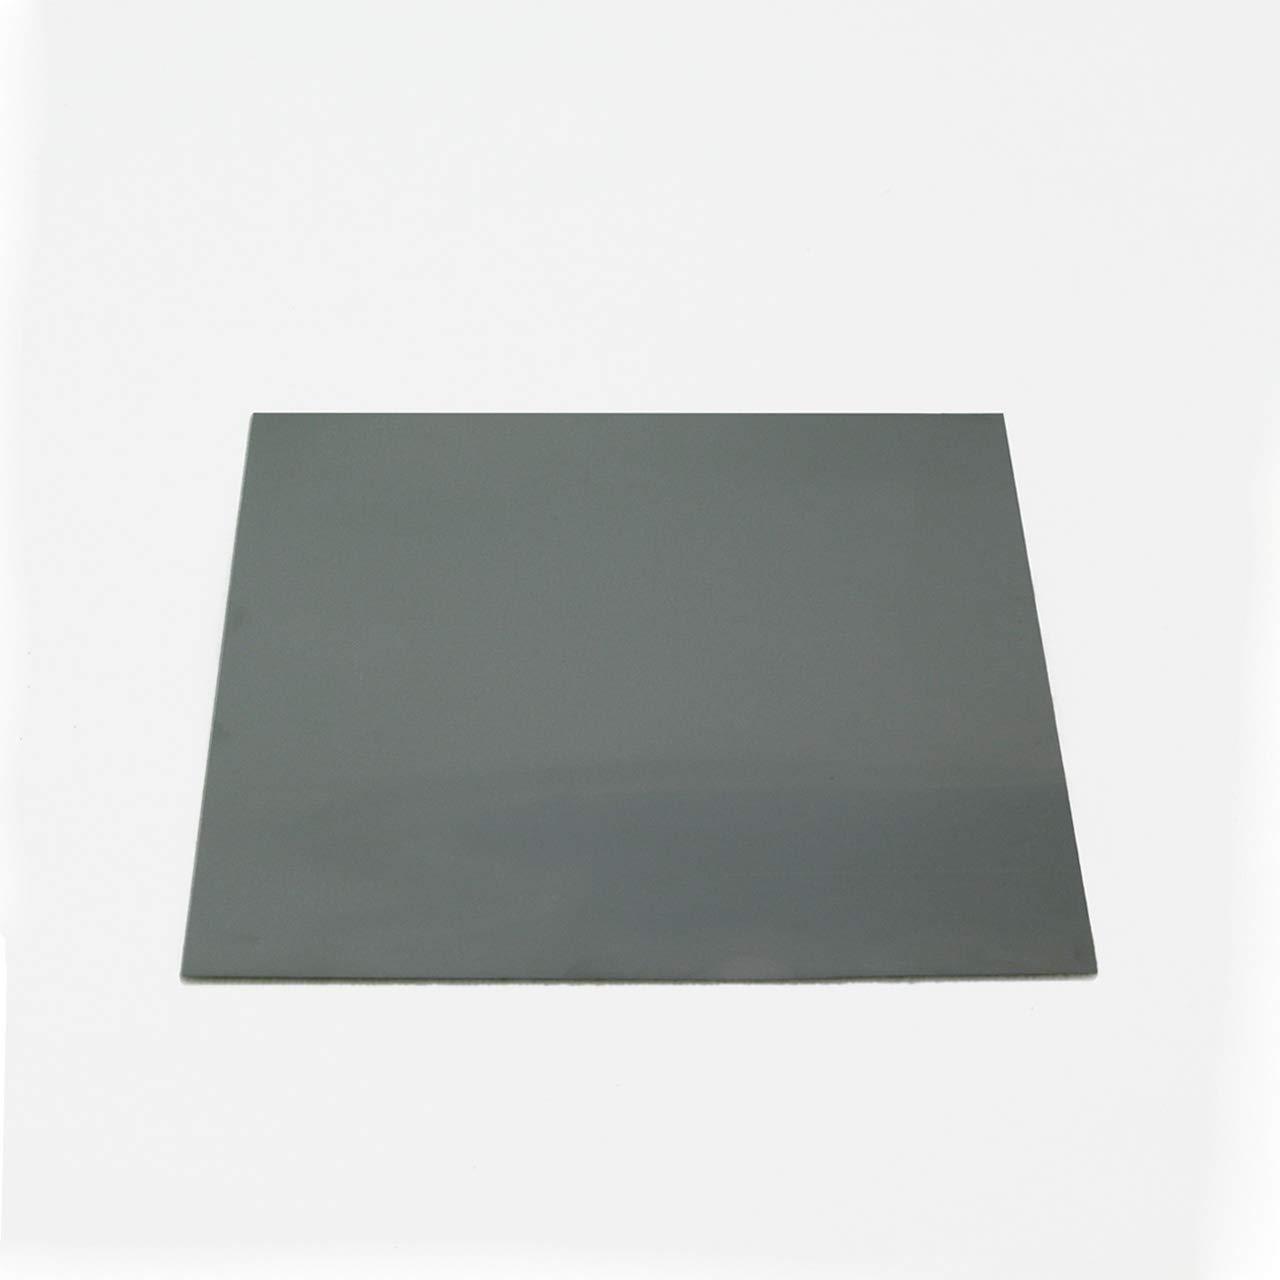 Molybdenum Sheet - 0.007